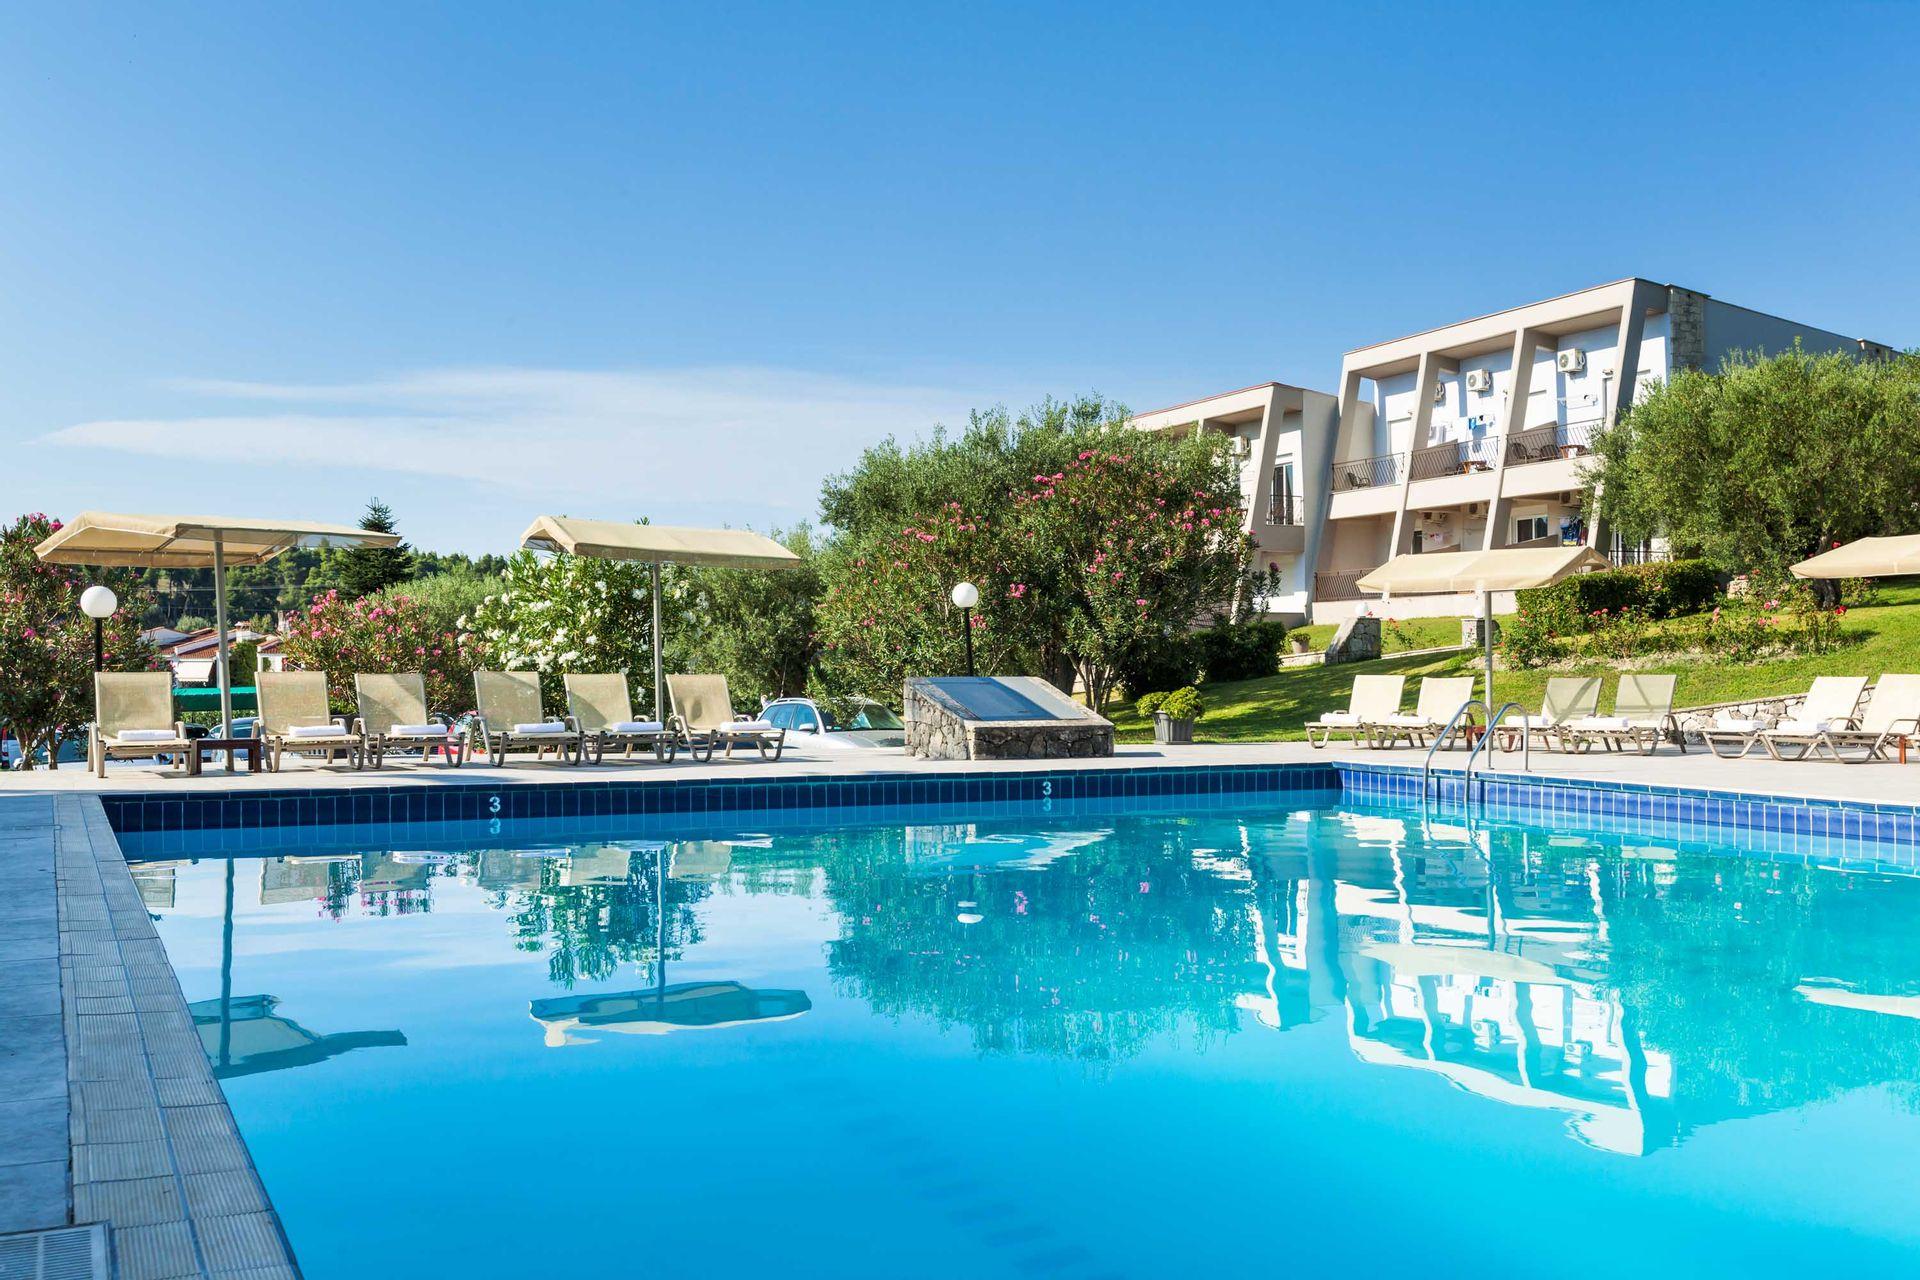 Iris Hotel - Κασσάνδρα, Χαλκιδική ✦ -10% ✦ 5 Ημέρες (4 Διανυκτερεύσεις) ✦ 2 άτομα ✦ Ημιδιατροφή ✦ 01/08/2021 έως 31/08/2021 ✦ Υπέροχη Τοποθεσία!